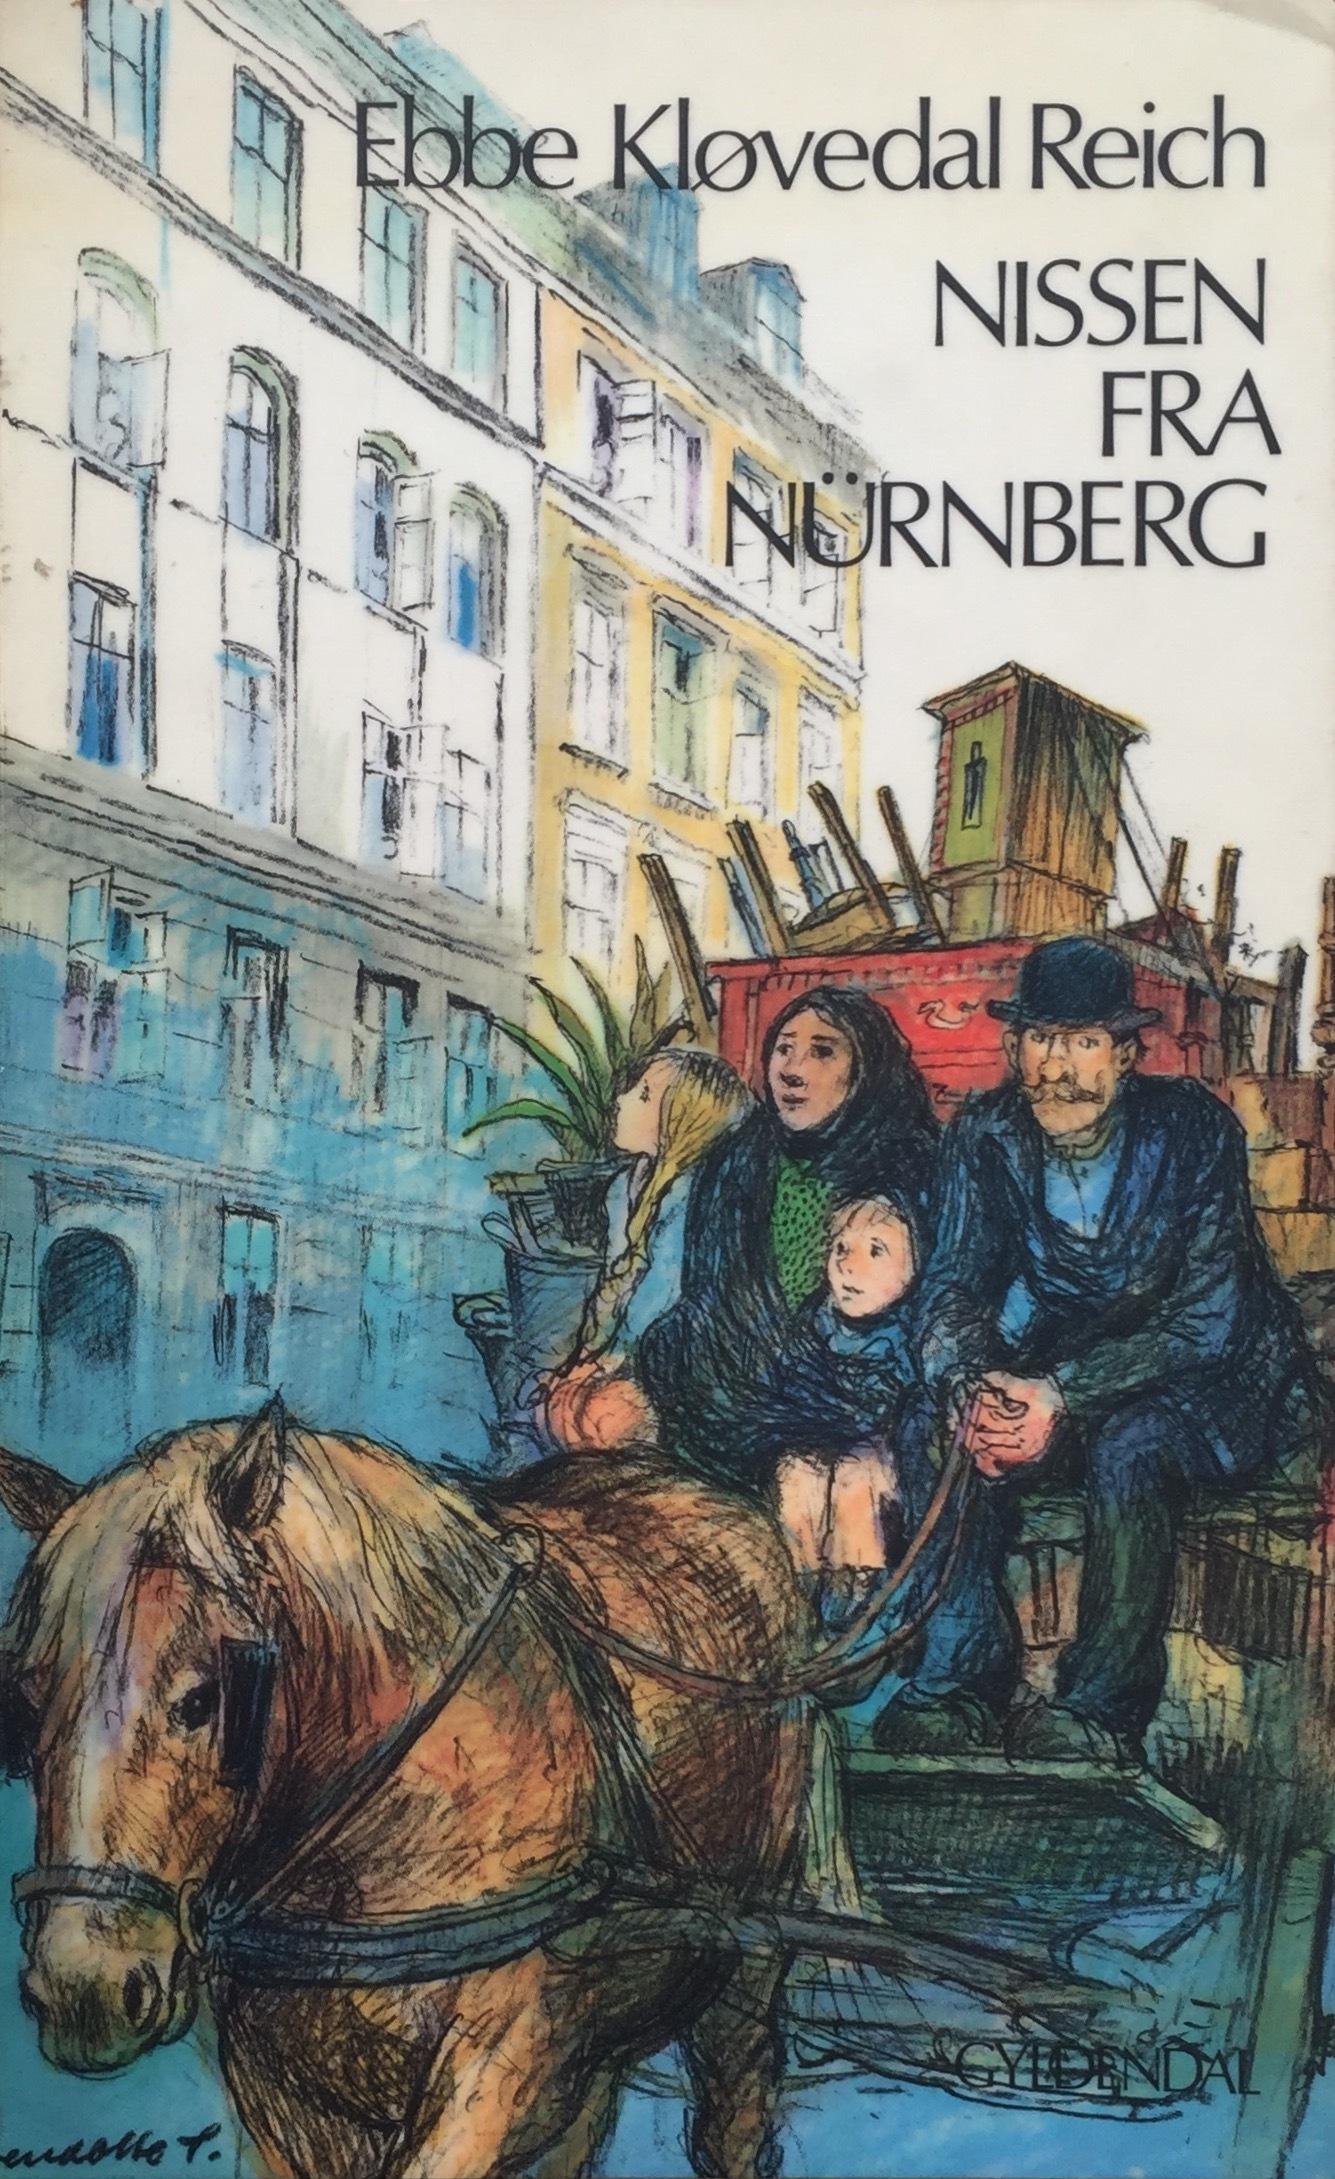 Nissen fra Nürnberg  by  Ebbe Kløvedal Reich